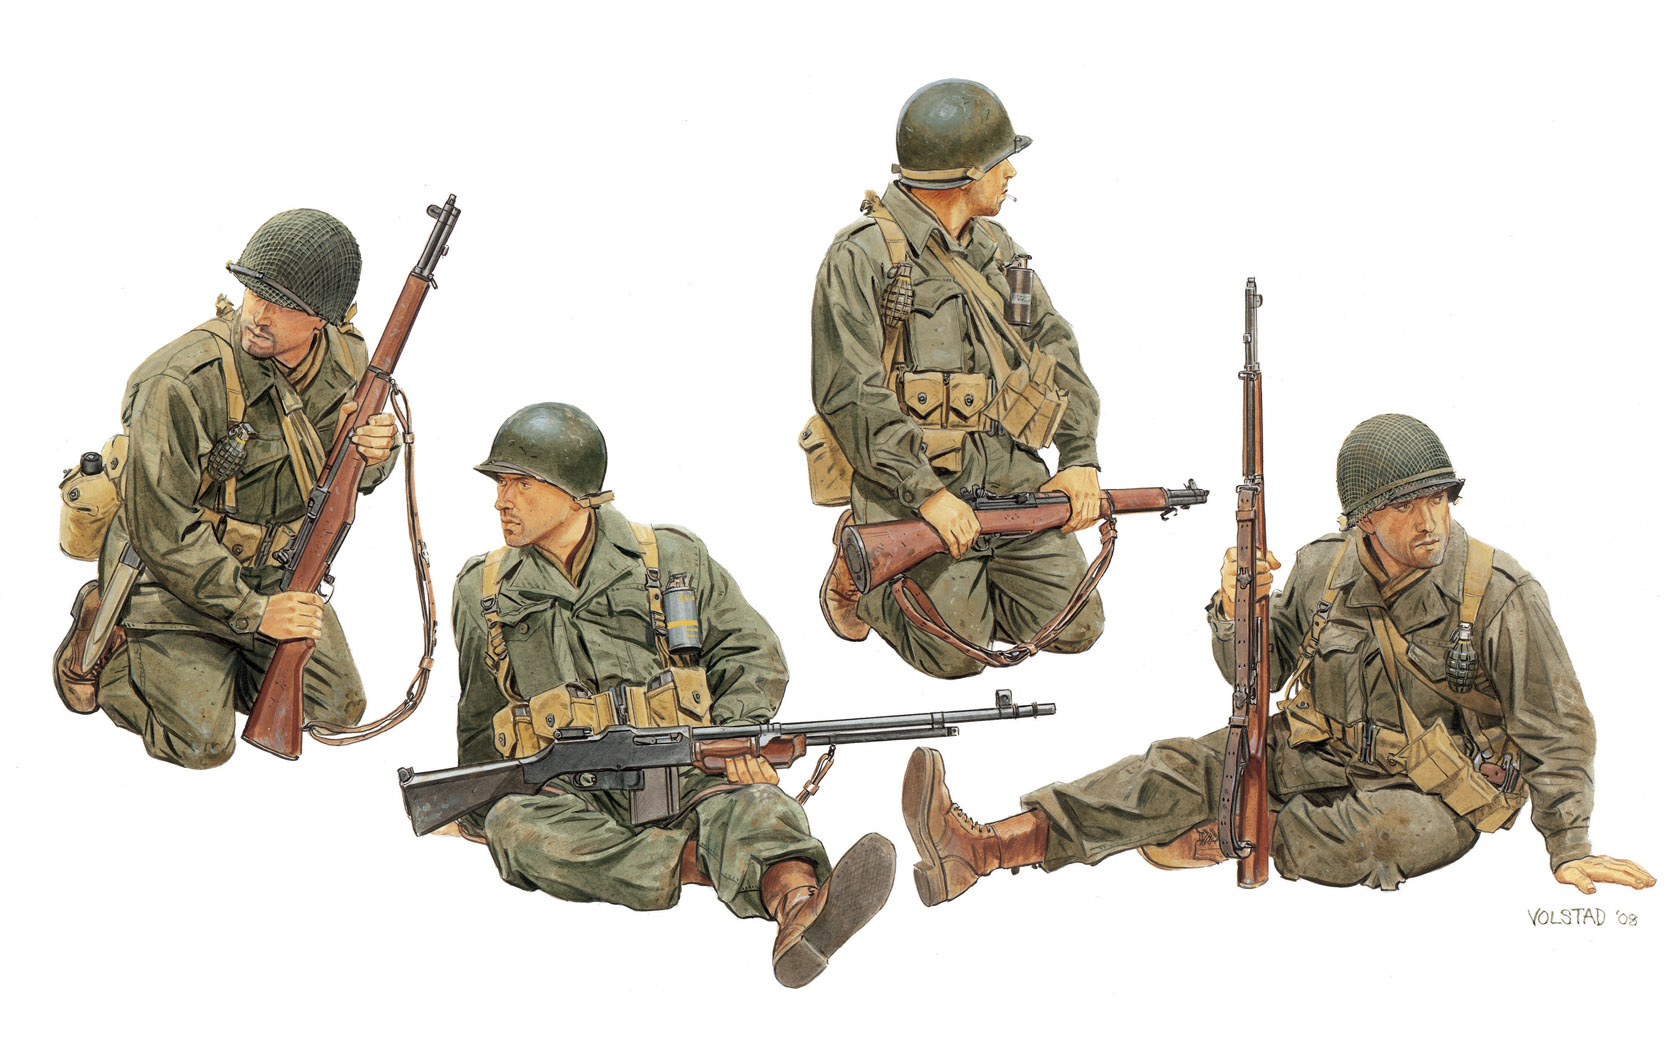 рисунок U.S. Army Tank Riders